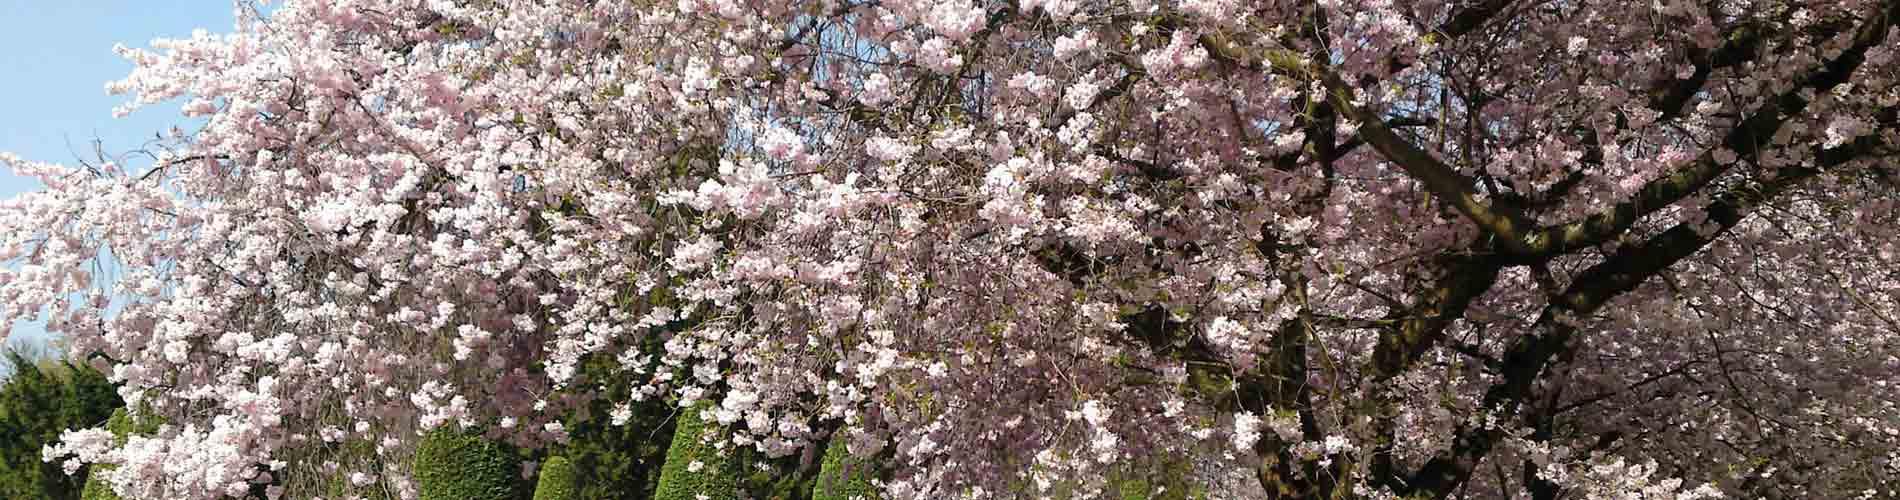 Blog_SpringFlowers_CherryBlossom_1900x500_Q120